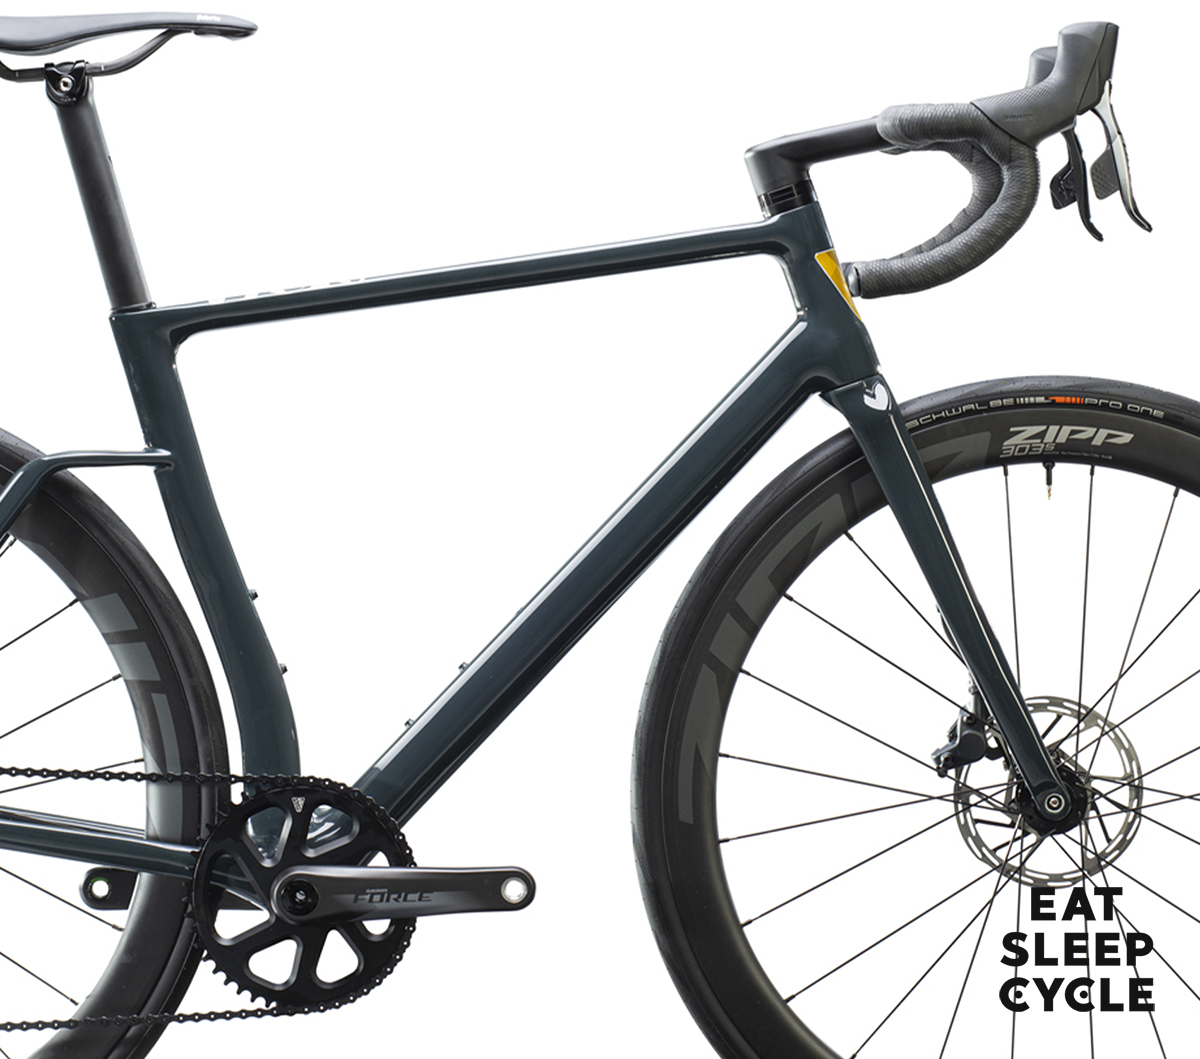 Eat-Sleep-Cycle-Cycling-Girona-Bike-Vielo-R1